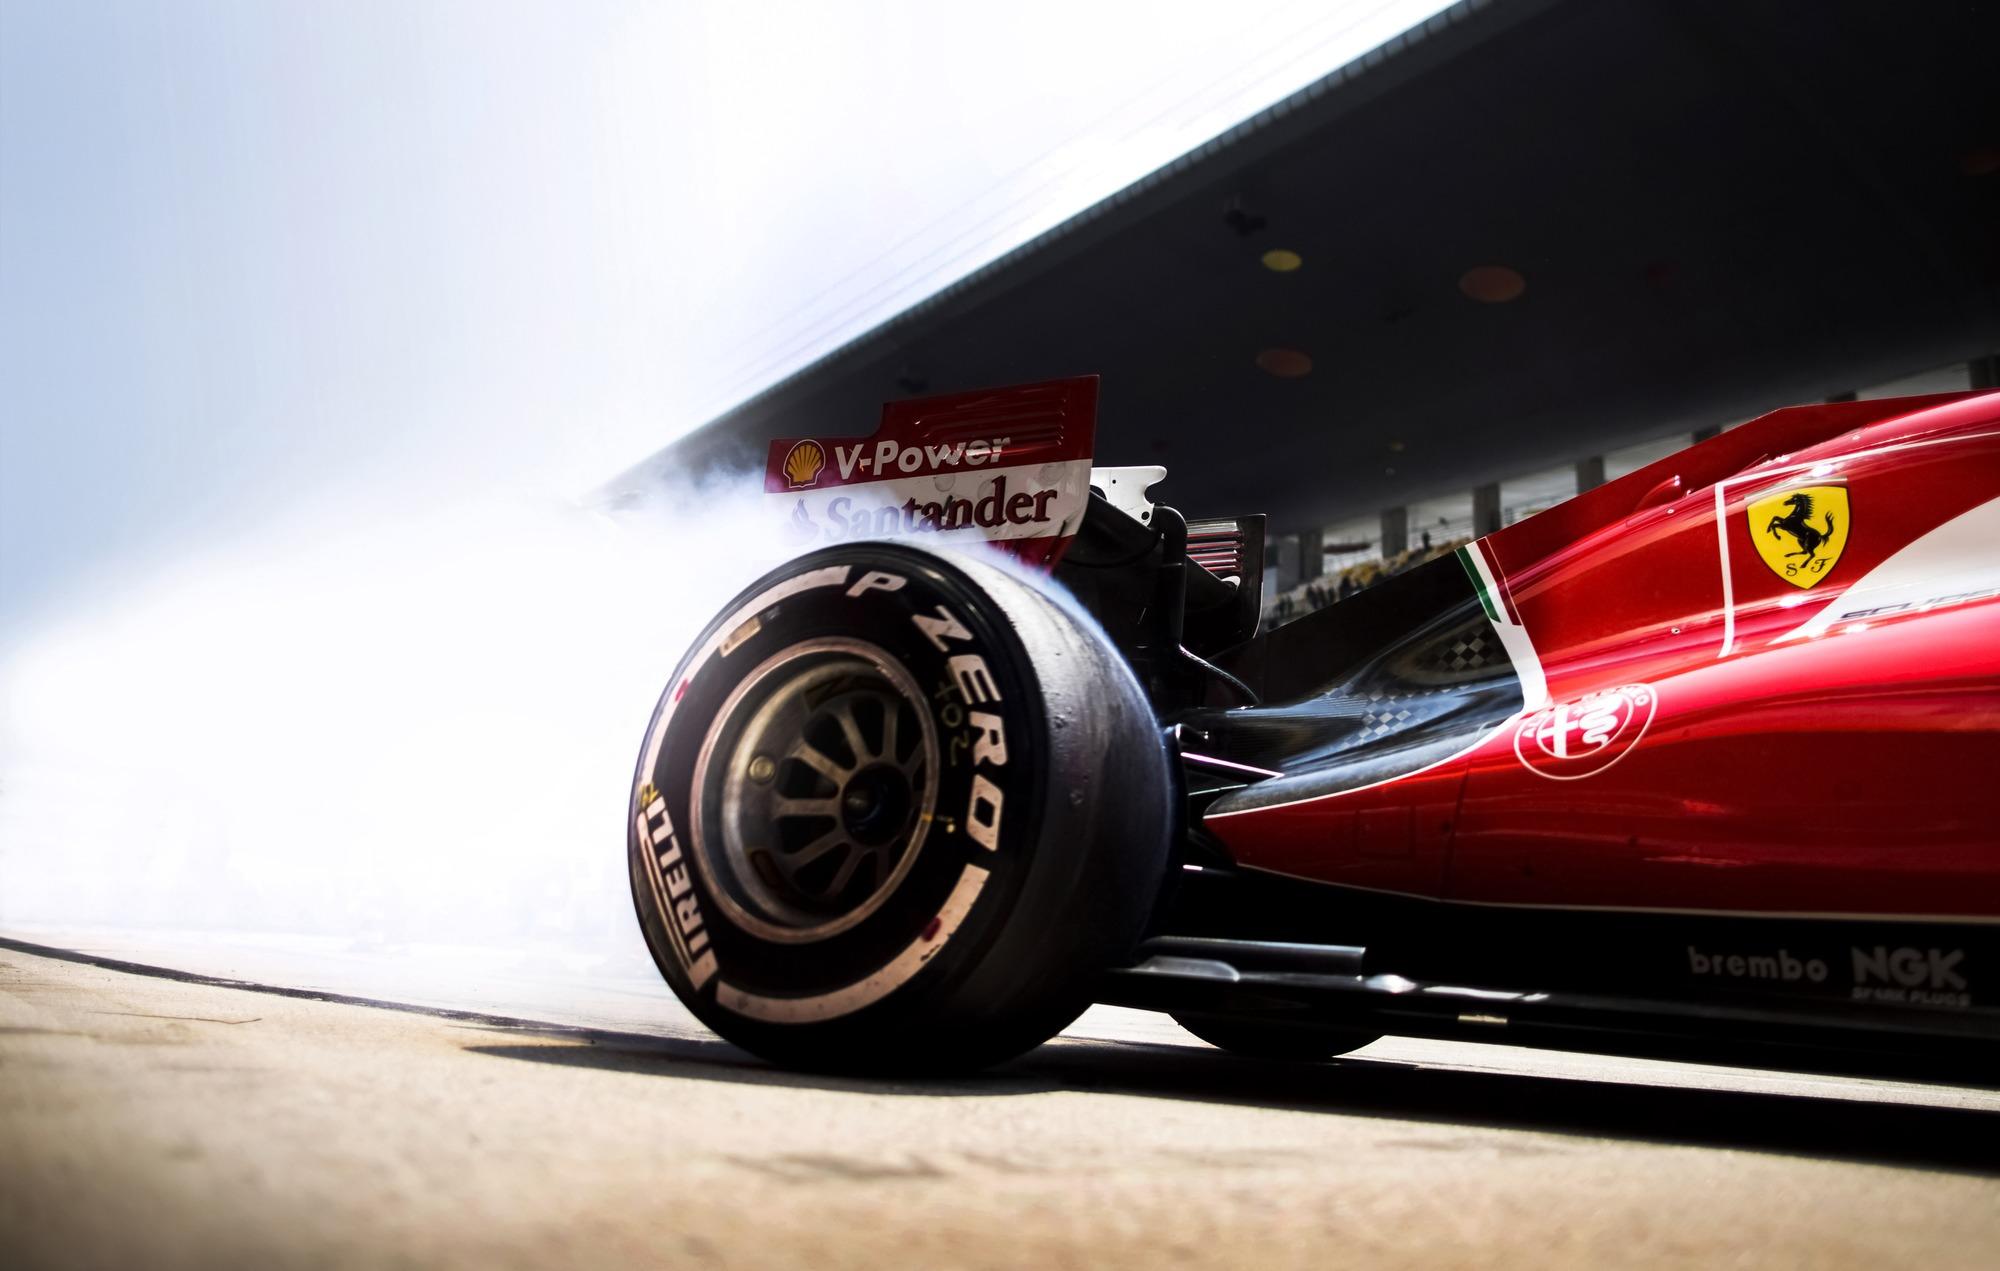 24+ F1 Ferrari Wallpapers on WallpaperSafari